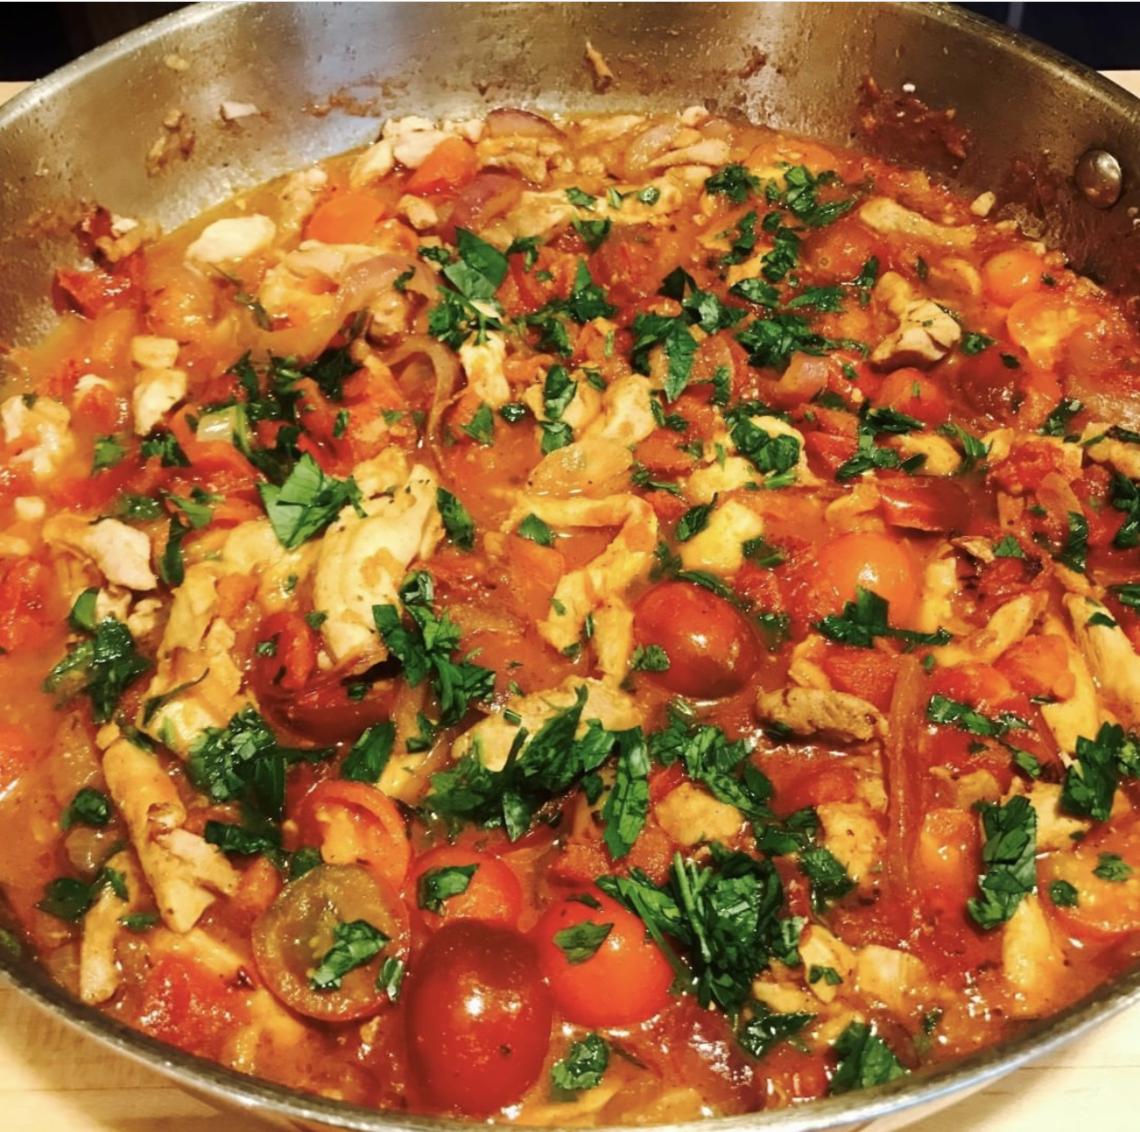 Berbere Spiced Stir Fry